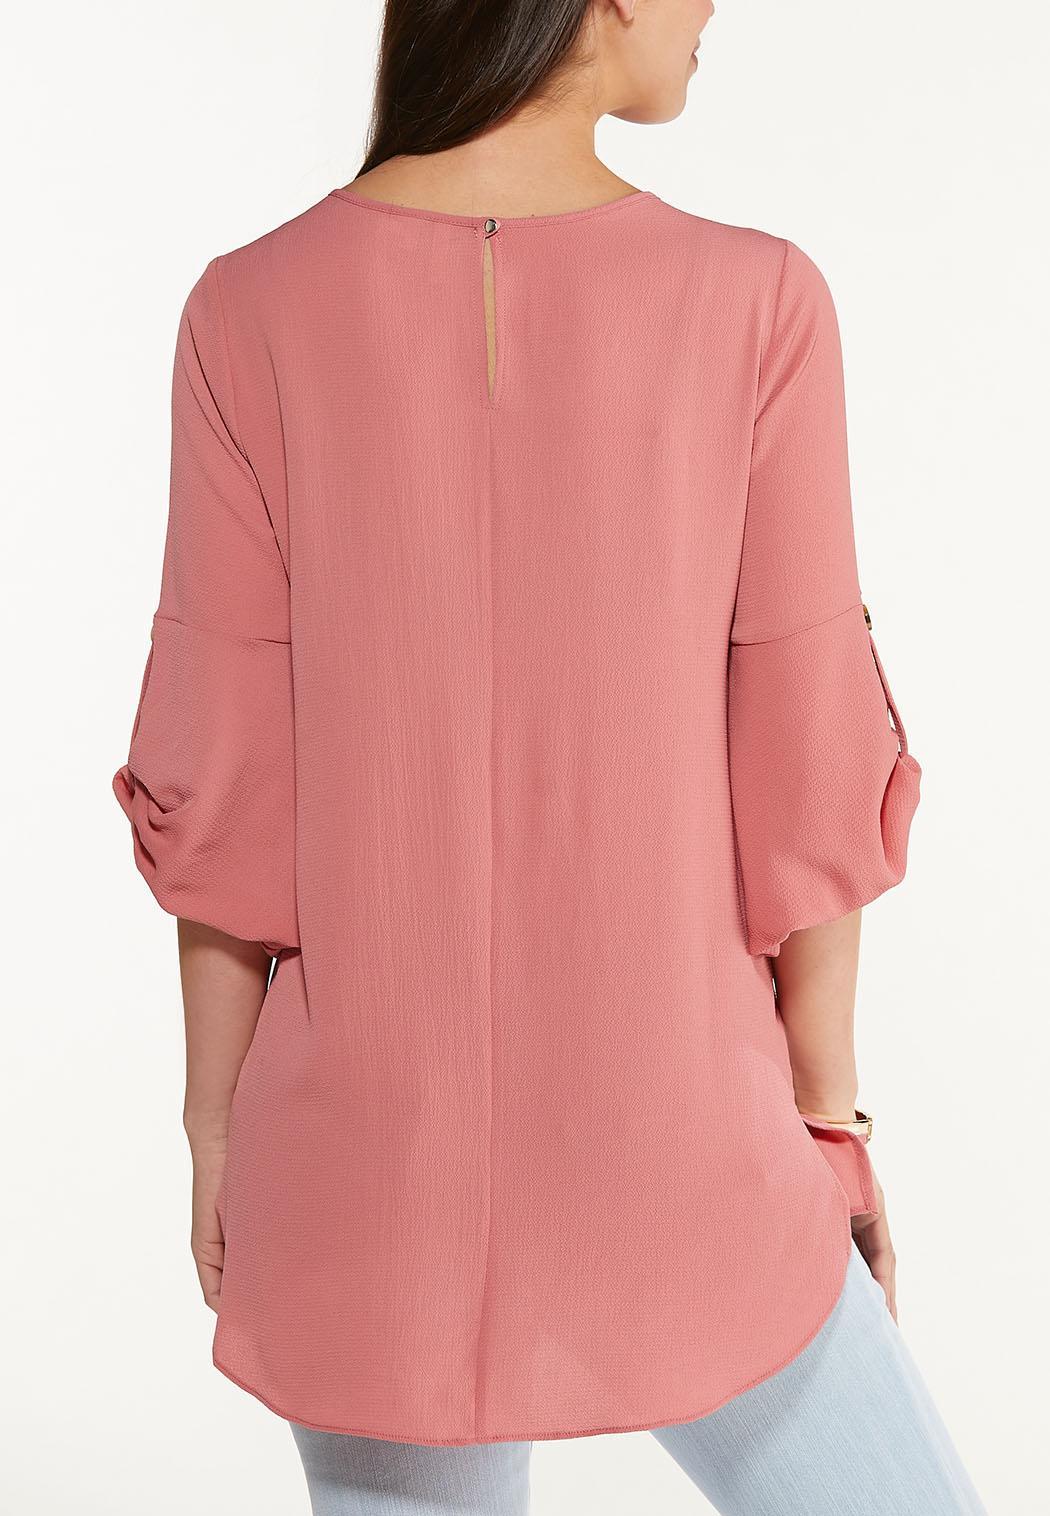 Plus Size Textured Tab Sleeve Top (Item #44560589)